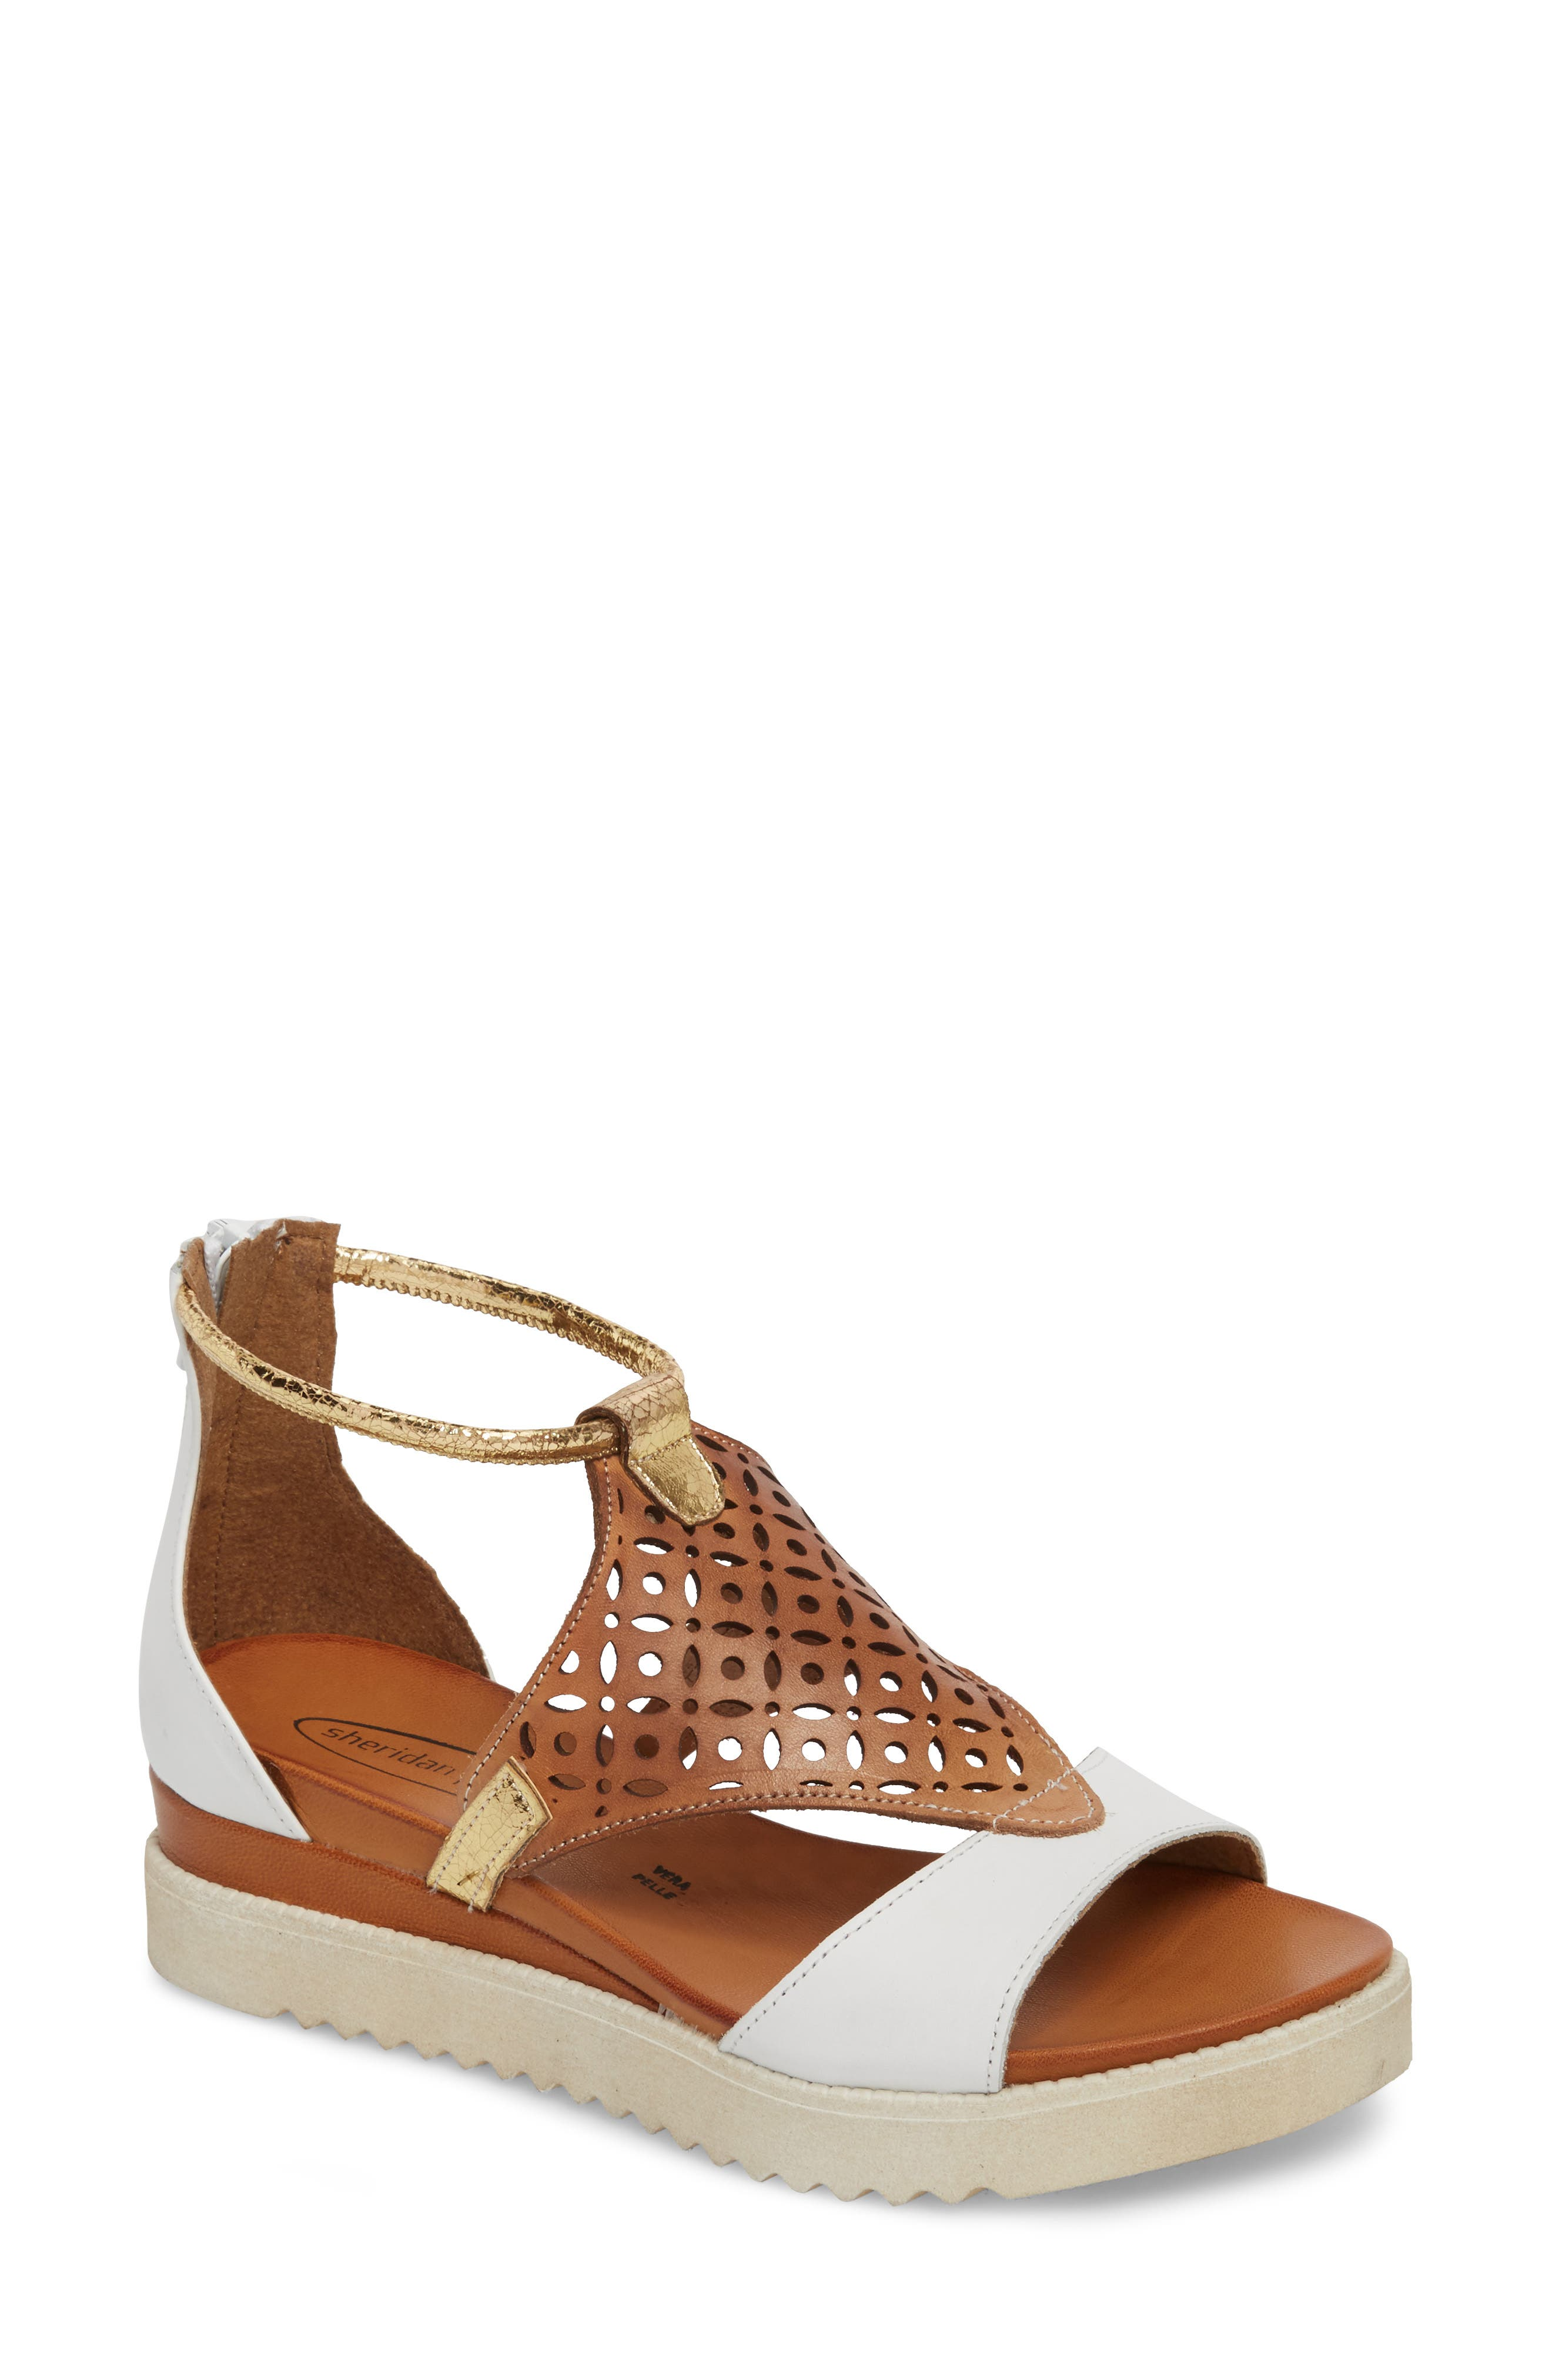 Sheridan Mia Blaze Sandal